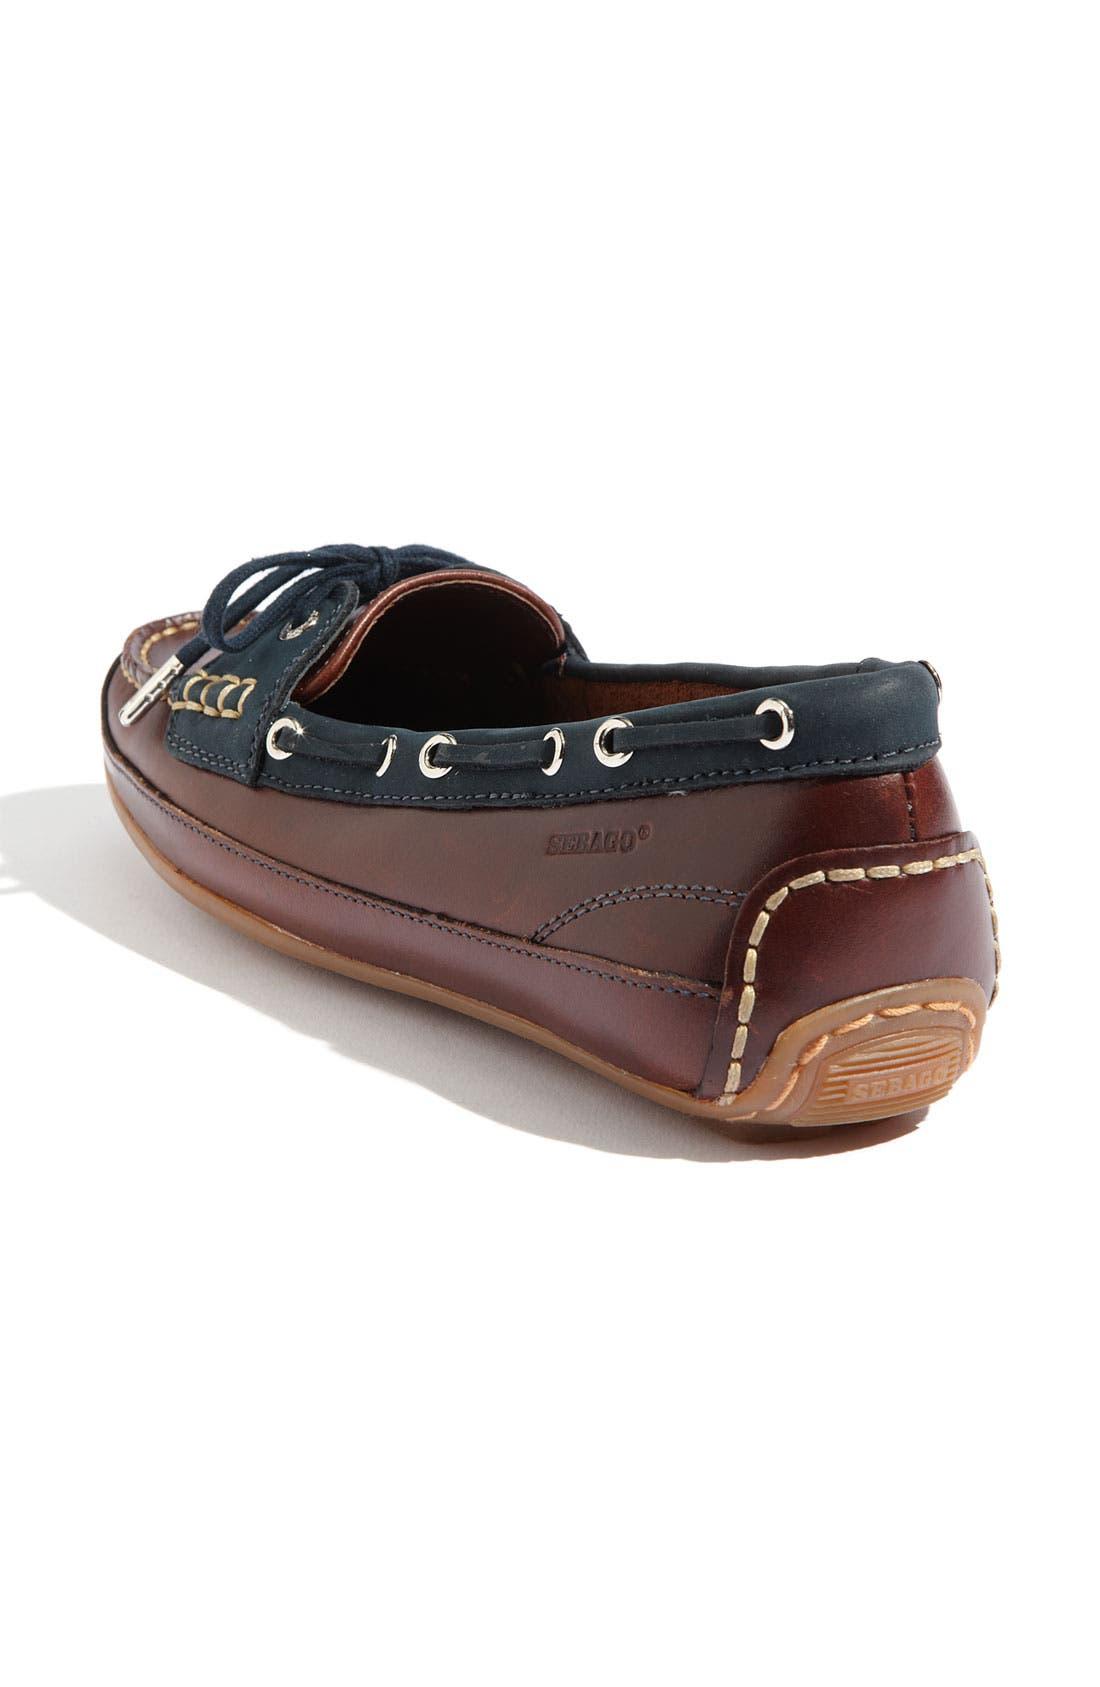 Alternate Image 2  - Sebago 'Bala' Boat Shoe